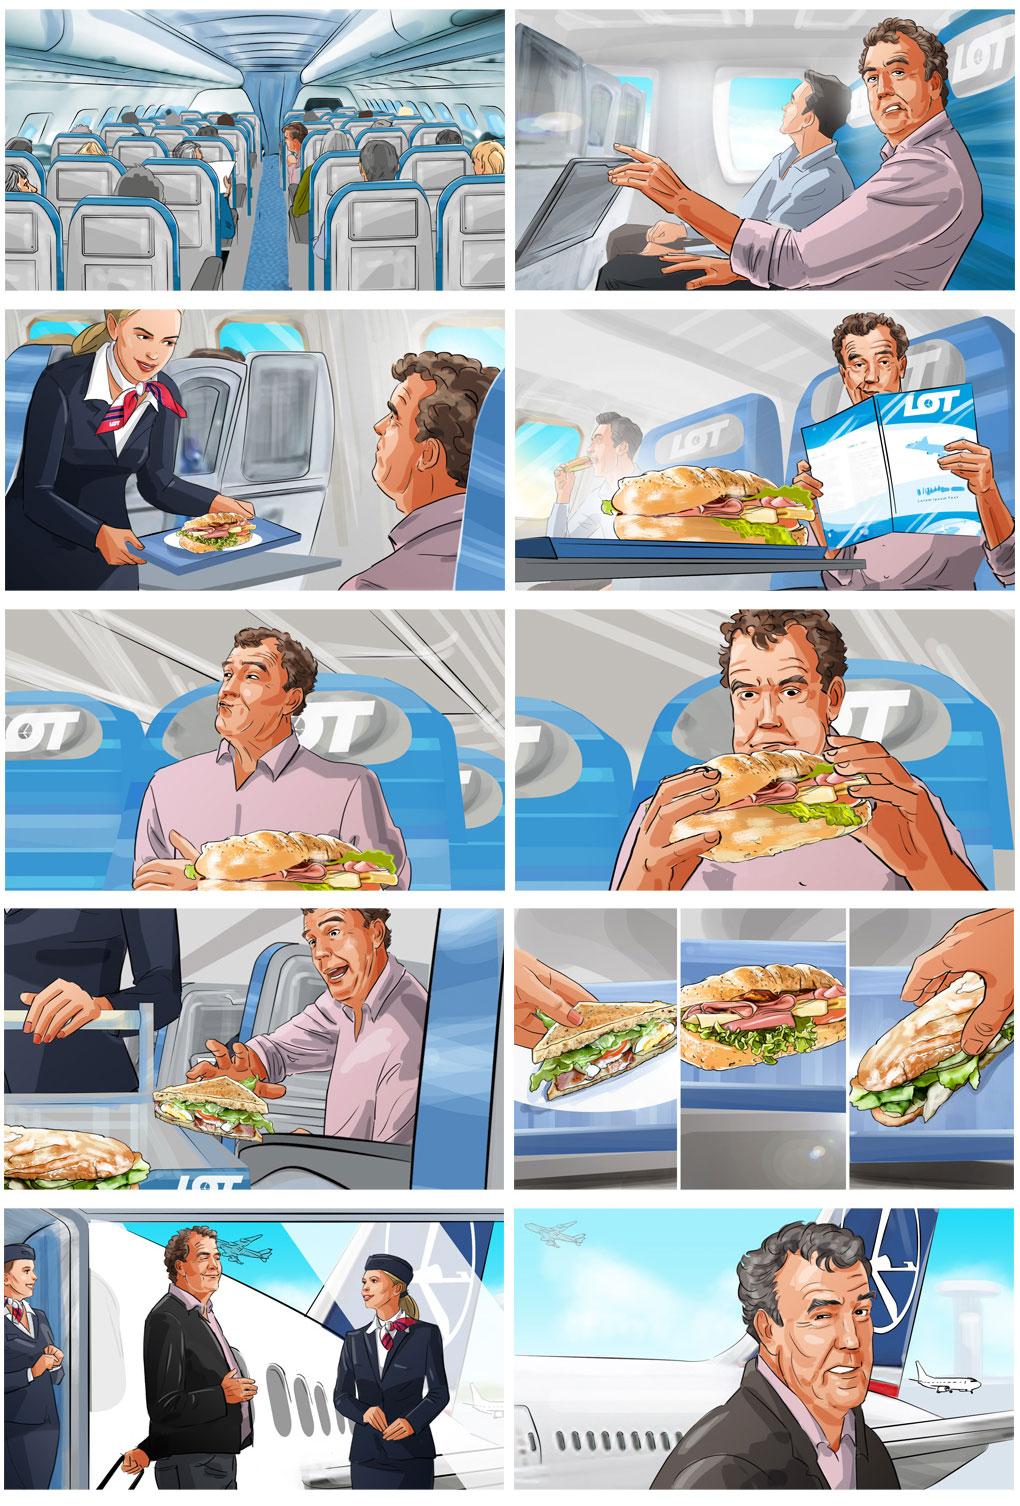 clarkson airplane sandwiches illustration storyboard